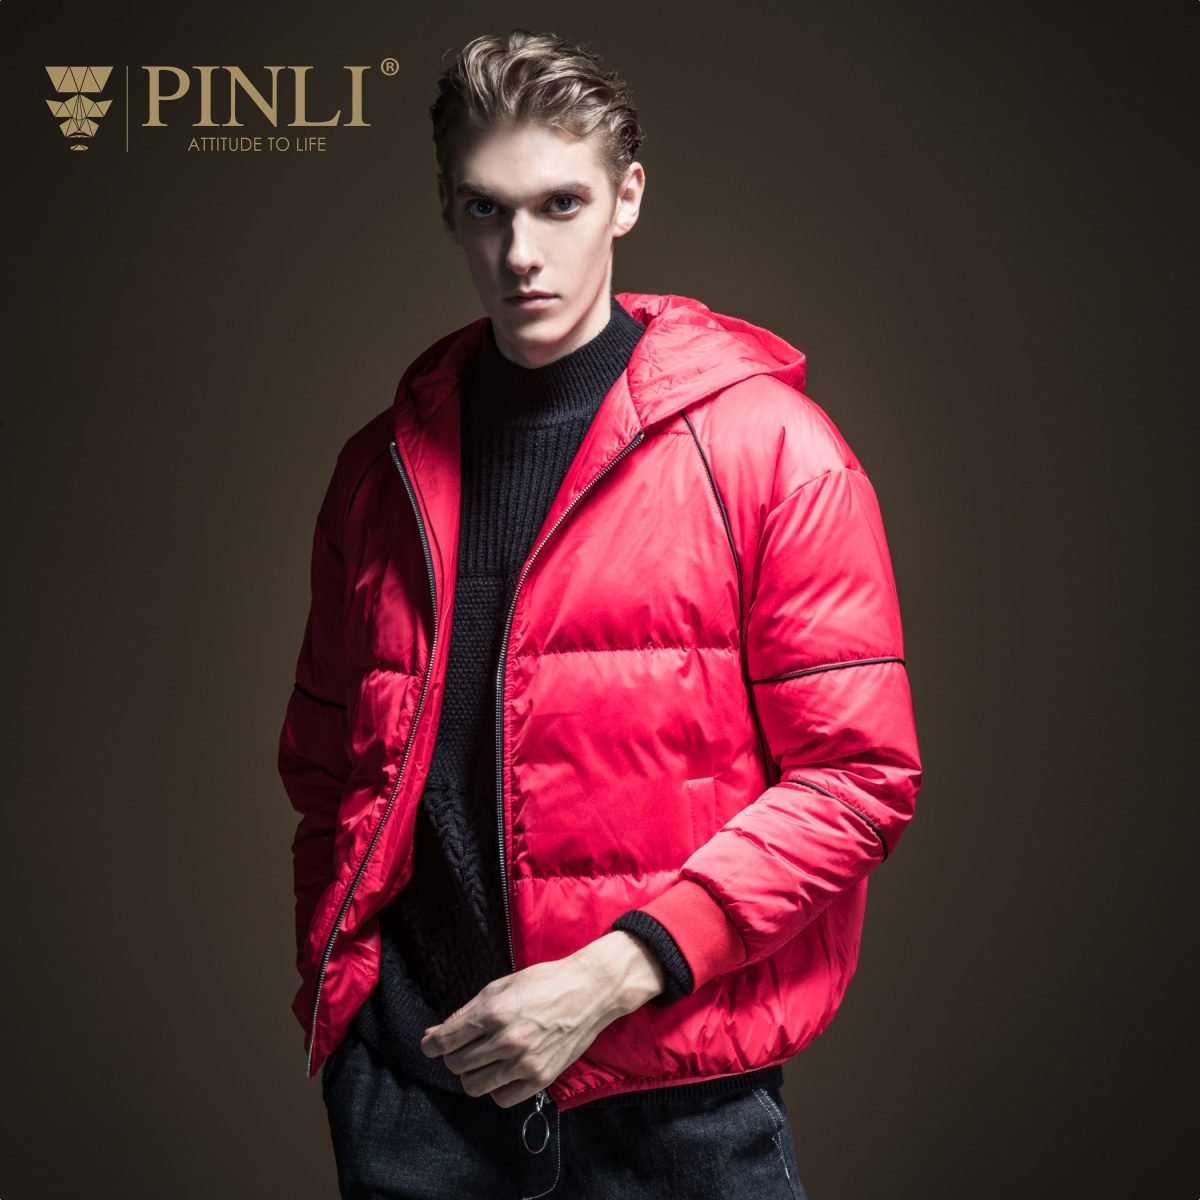 Down Jacket Rushed Jacket New Arrival 2019 Sale Sobretudo Pinli Winter Men's Solid Color Short Hooded Casual Coat B194208811